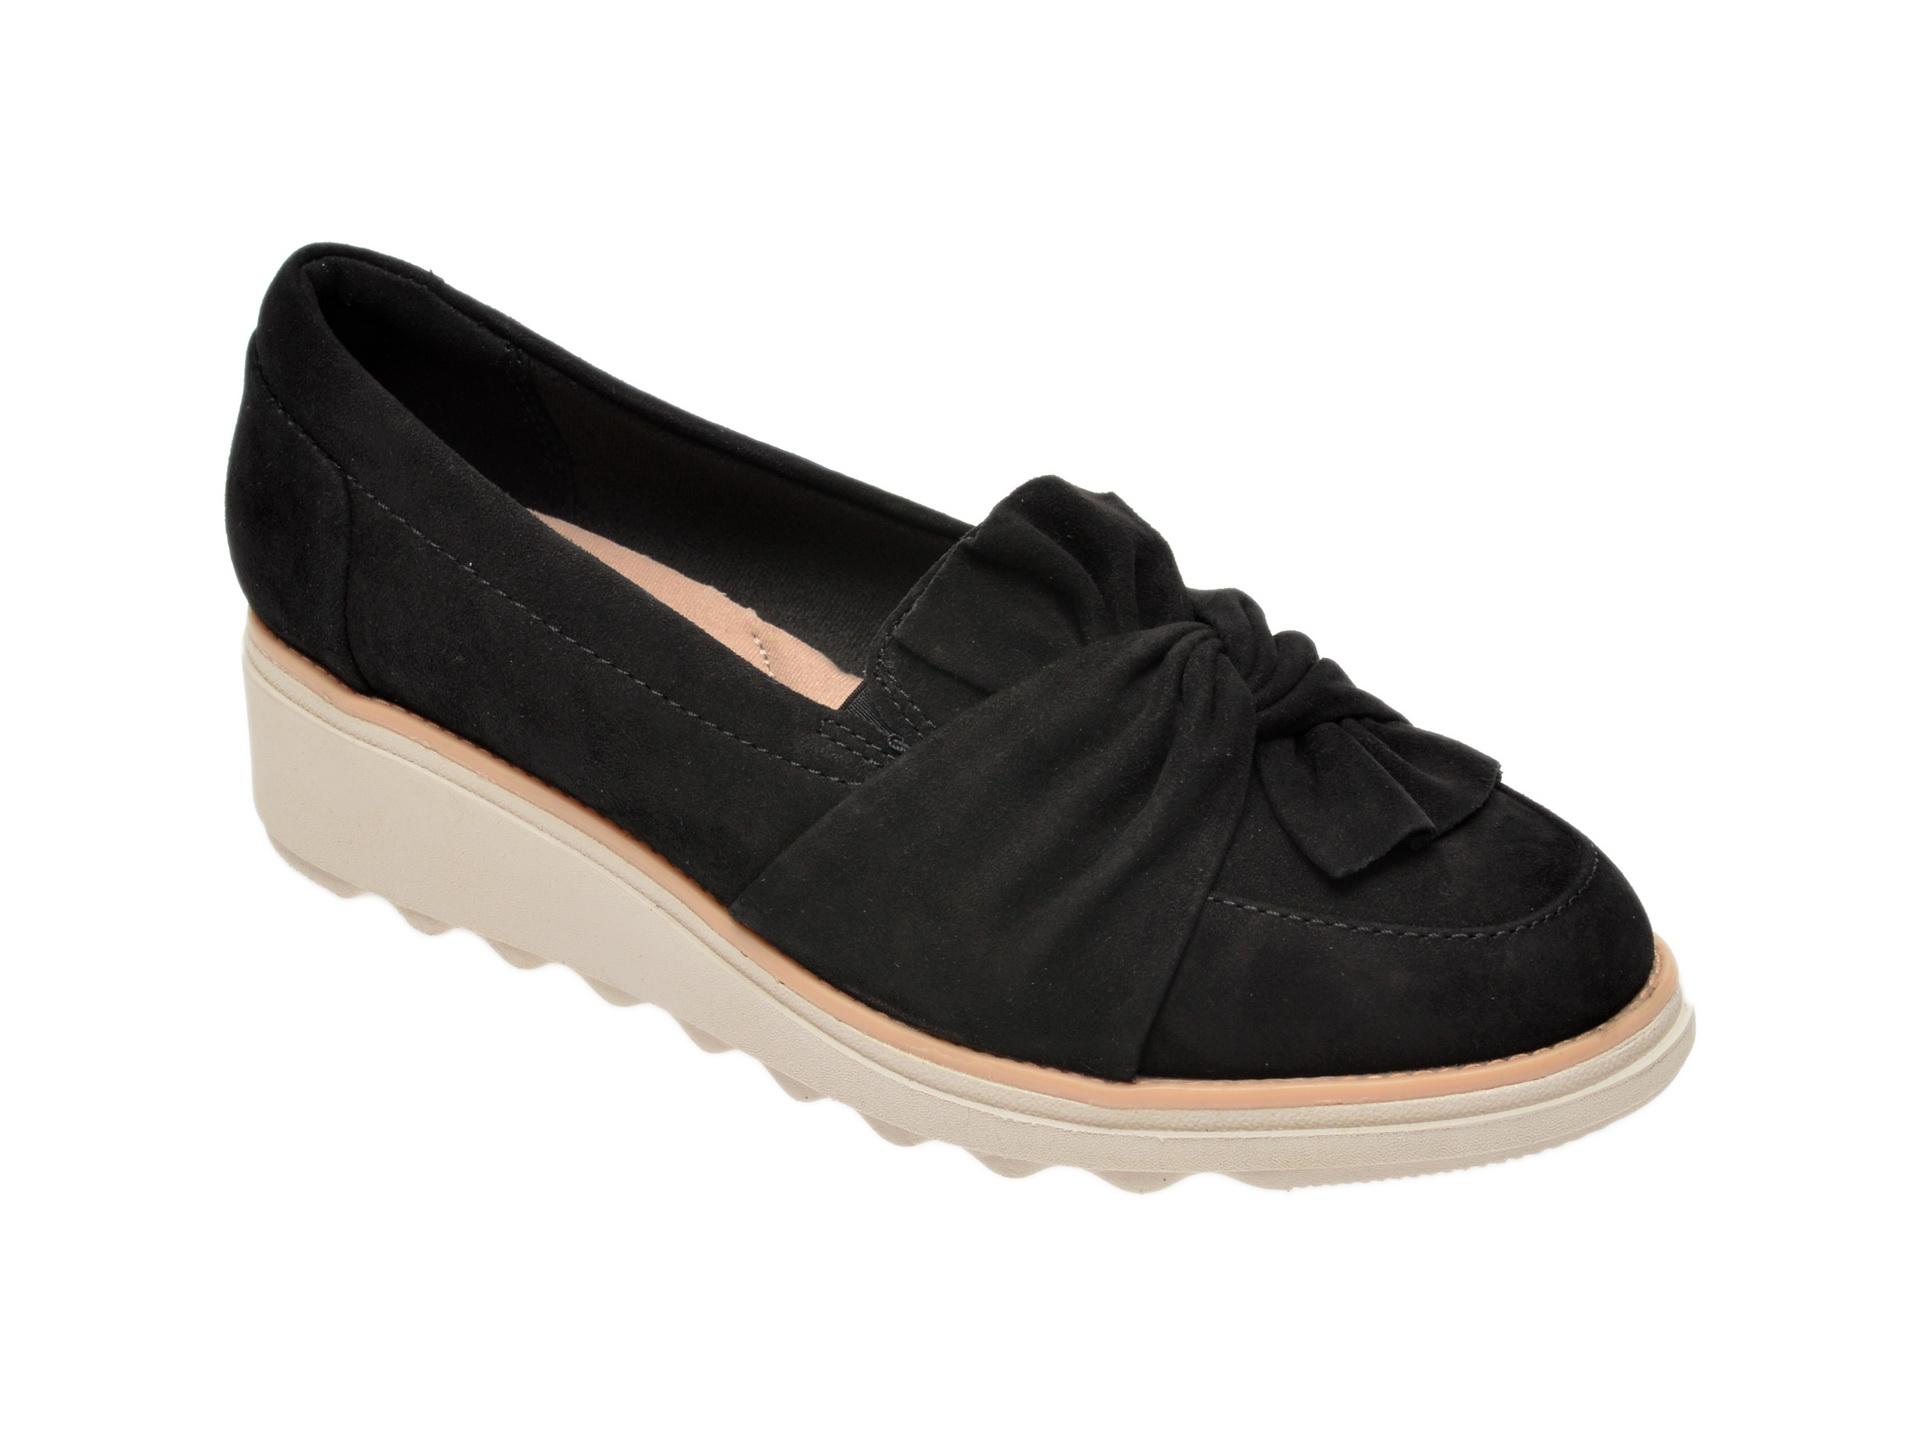 Pantofi CLARKS negri, Sharon Dasher, din piele intoarsa imagine